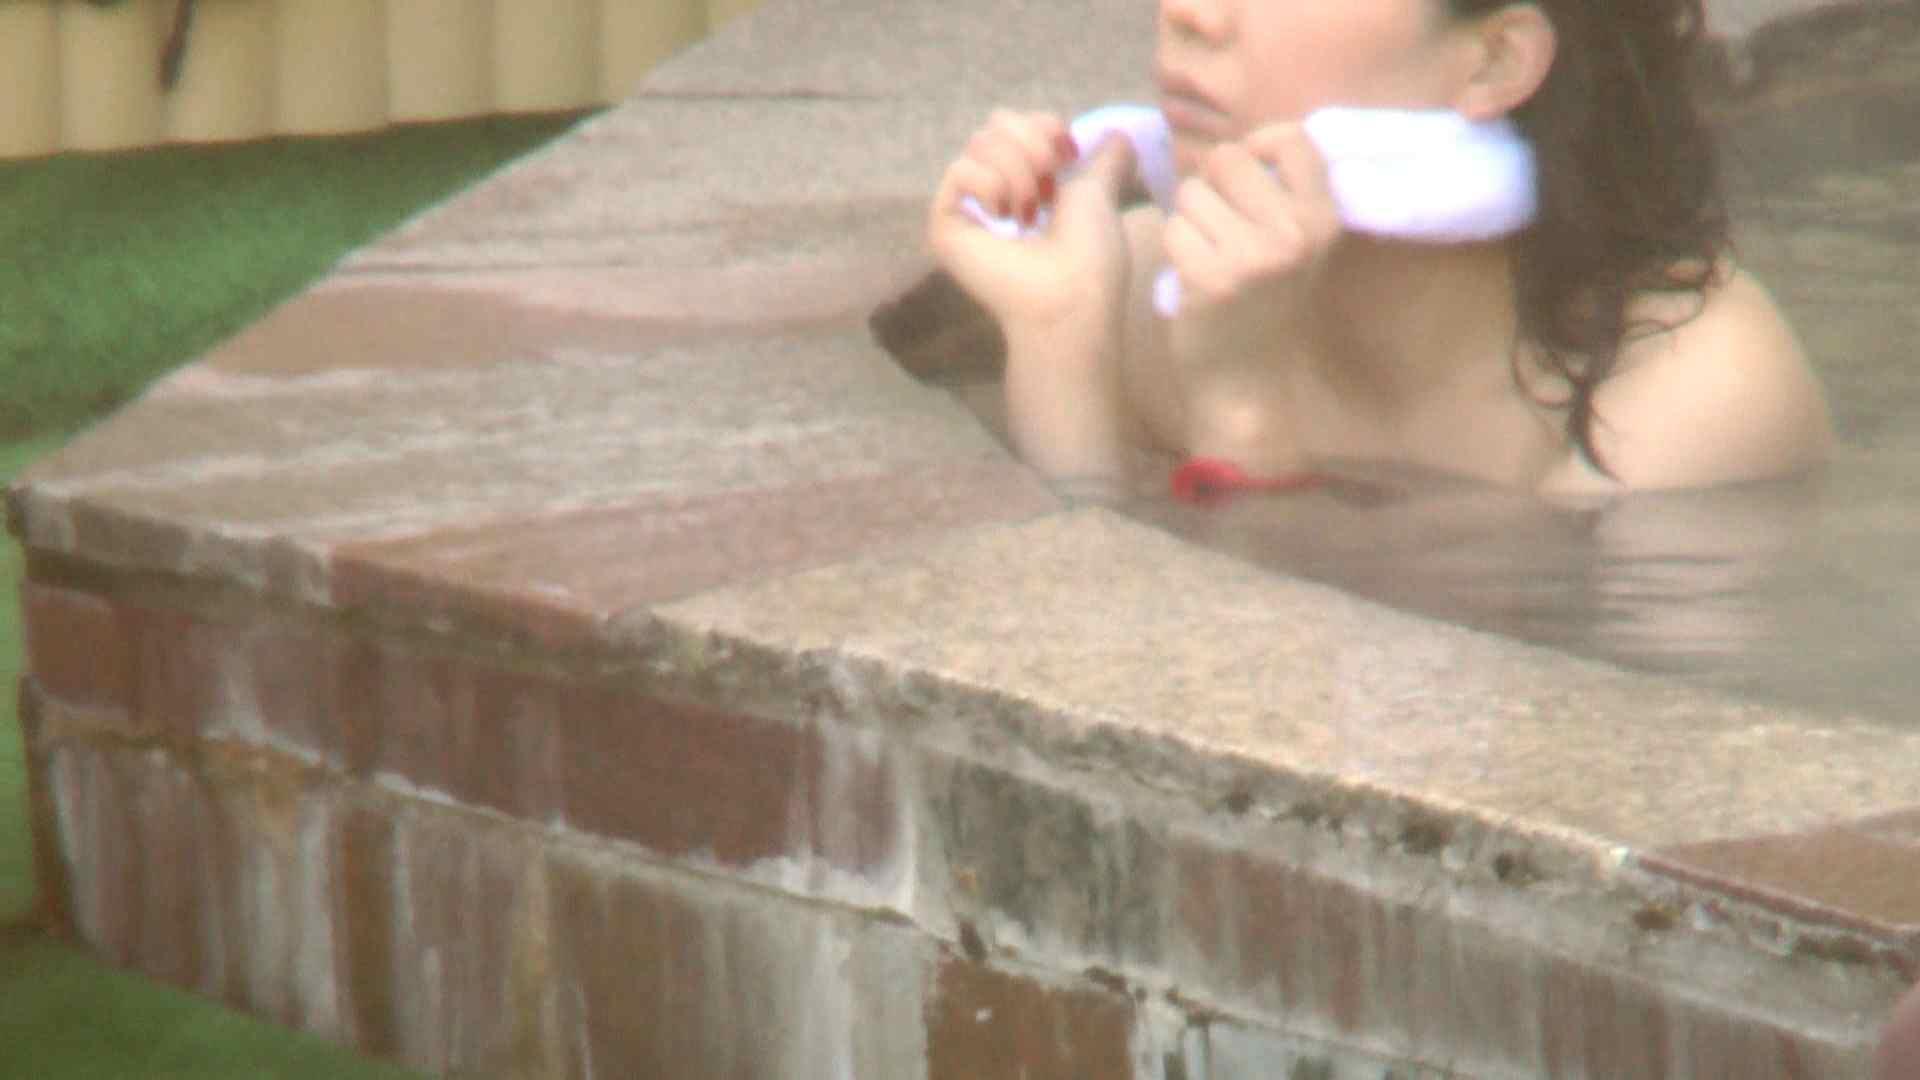 Aquaな露天風呂Vol.211 OLセックス 盗撮アダルト動画キャプチャ 68画像 44